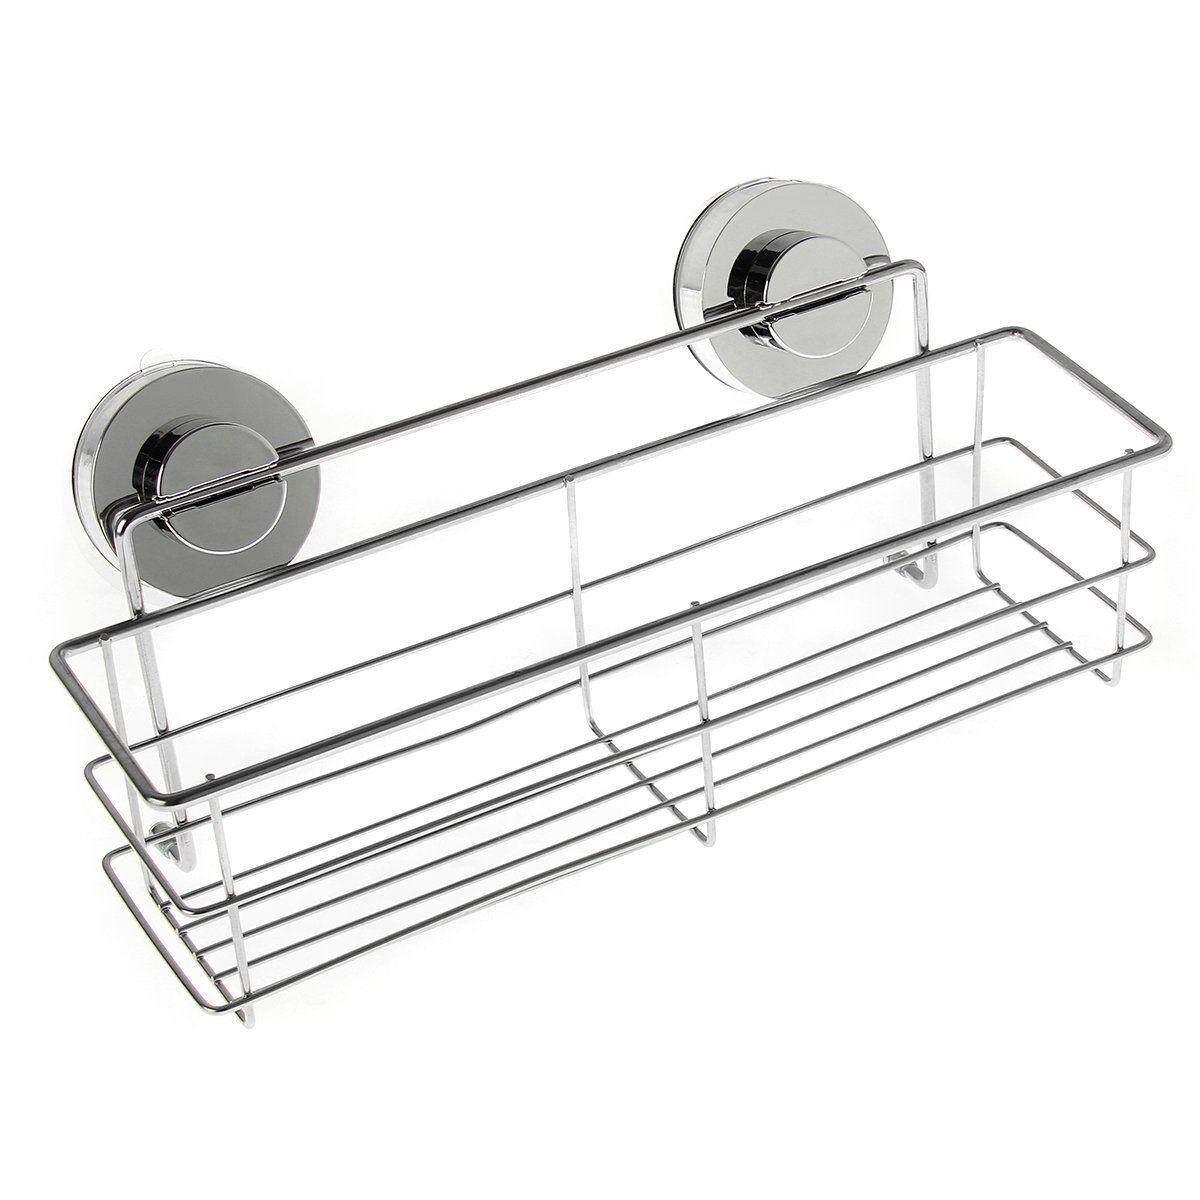 Stainless Steel Kitchen Bathroom Shower Storage Basket Caddy Shelf Suction Cup By Moonbeam